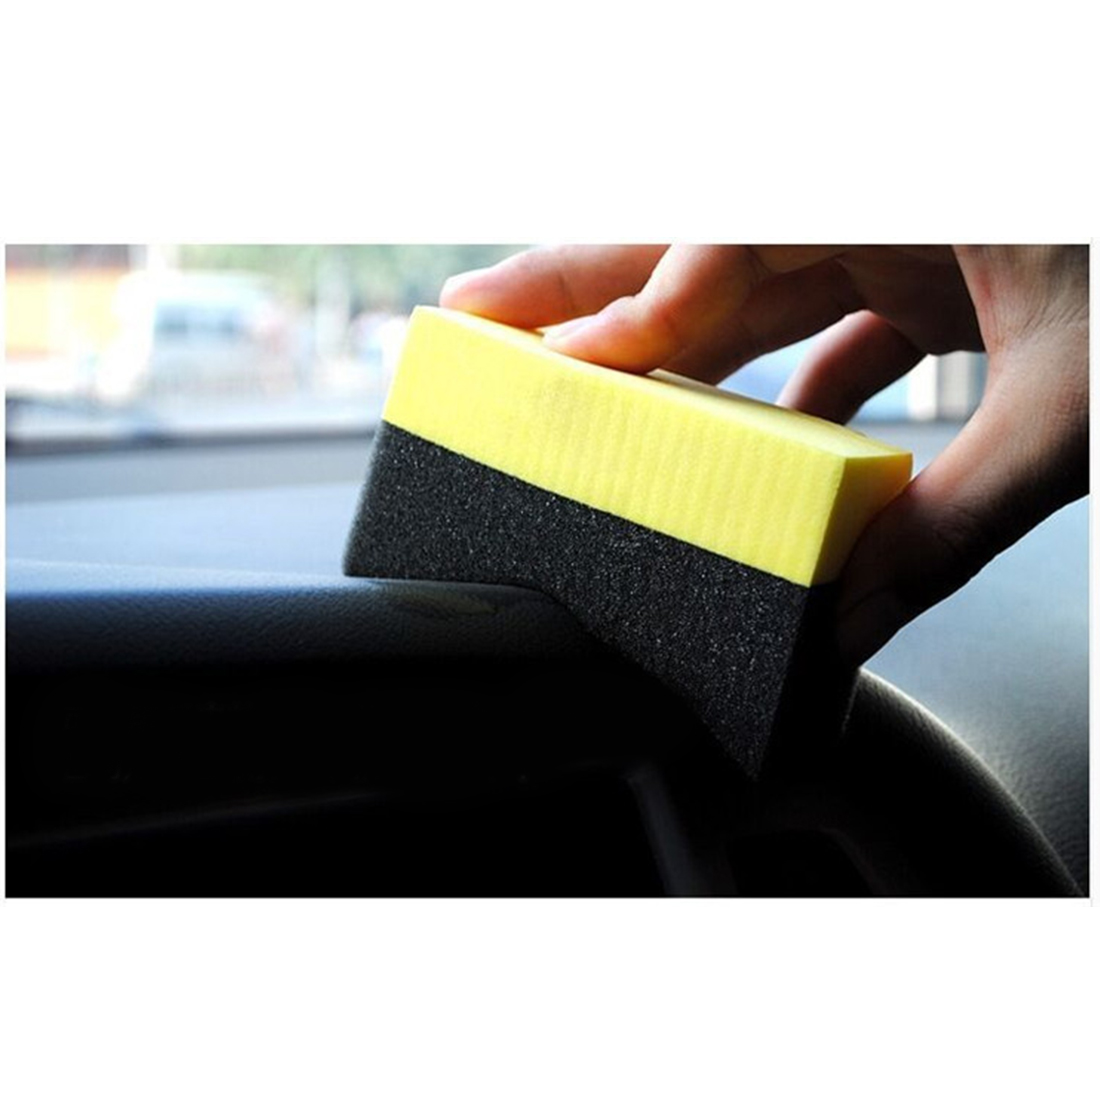 2pcs Tyre Brush Car Cleaning Sponge Vacuum Compressed Sponge Auto Tire Wax Polishing Compound Sponge ARC Edge Sponge New Arrival